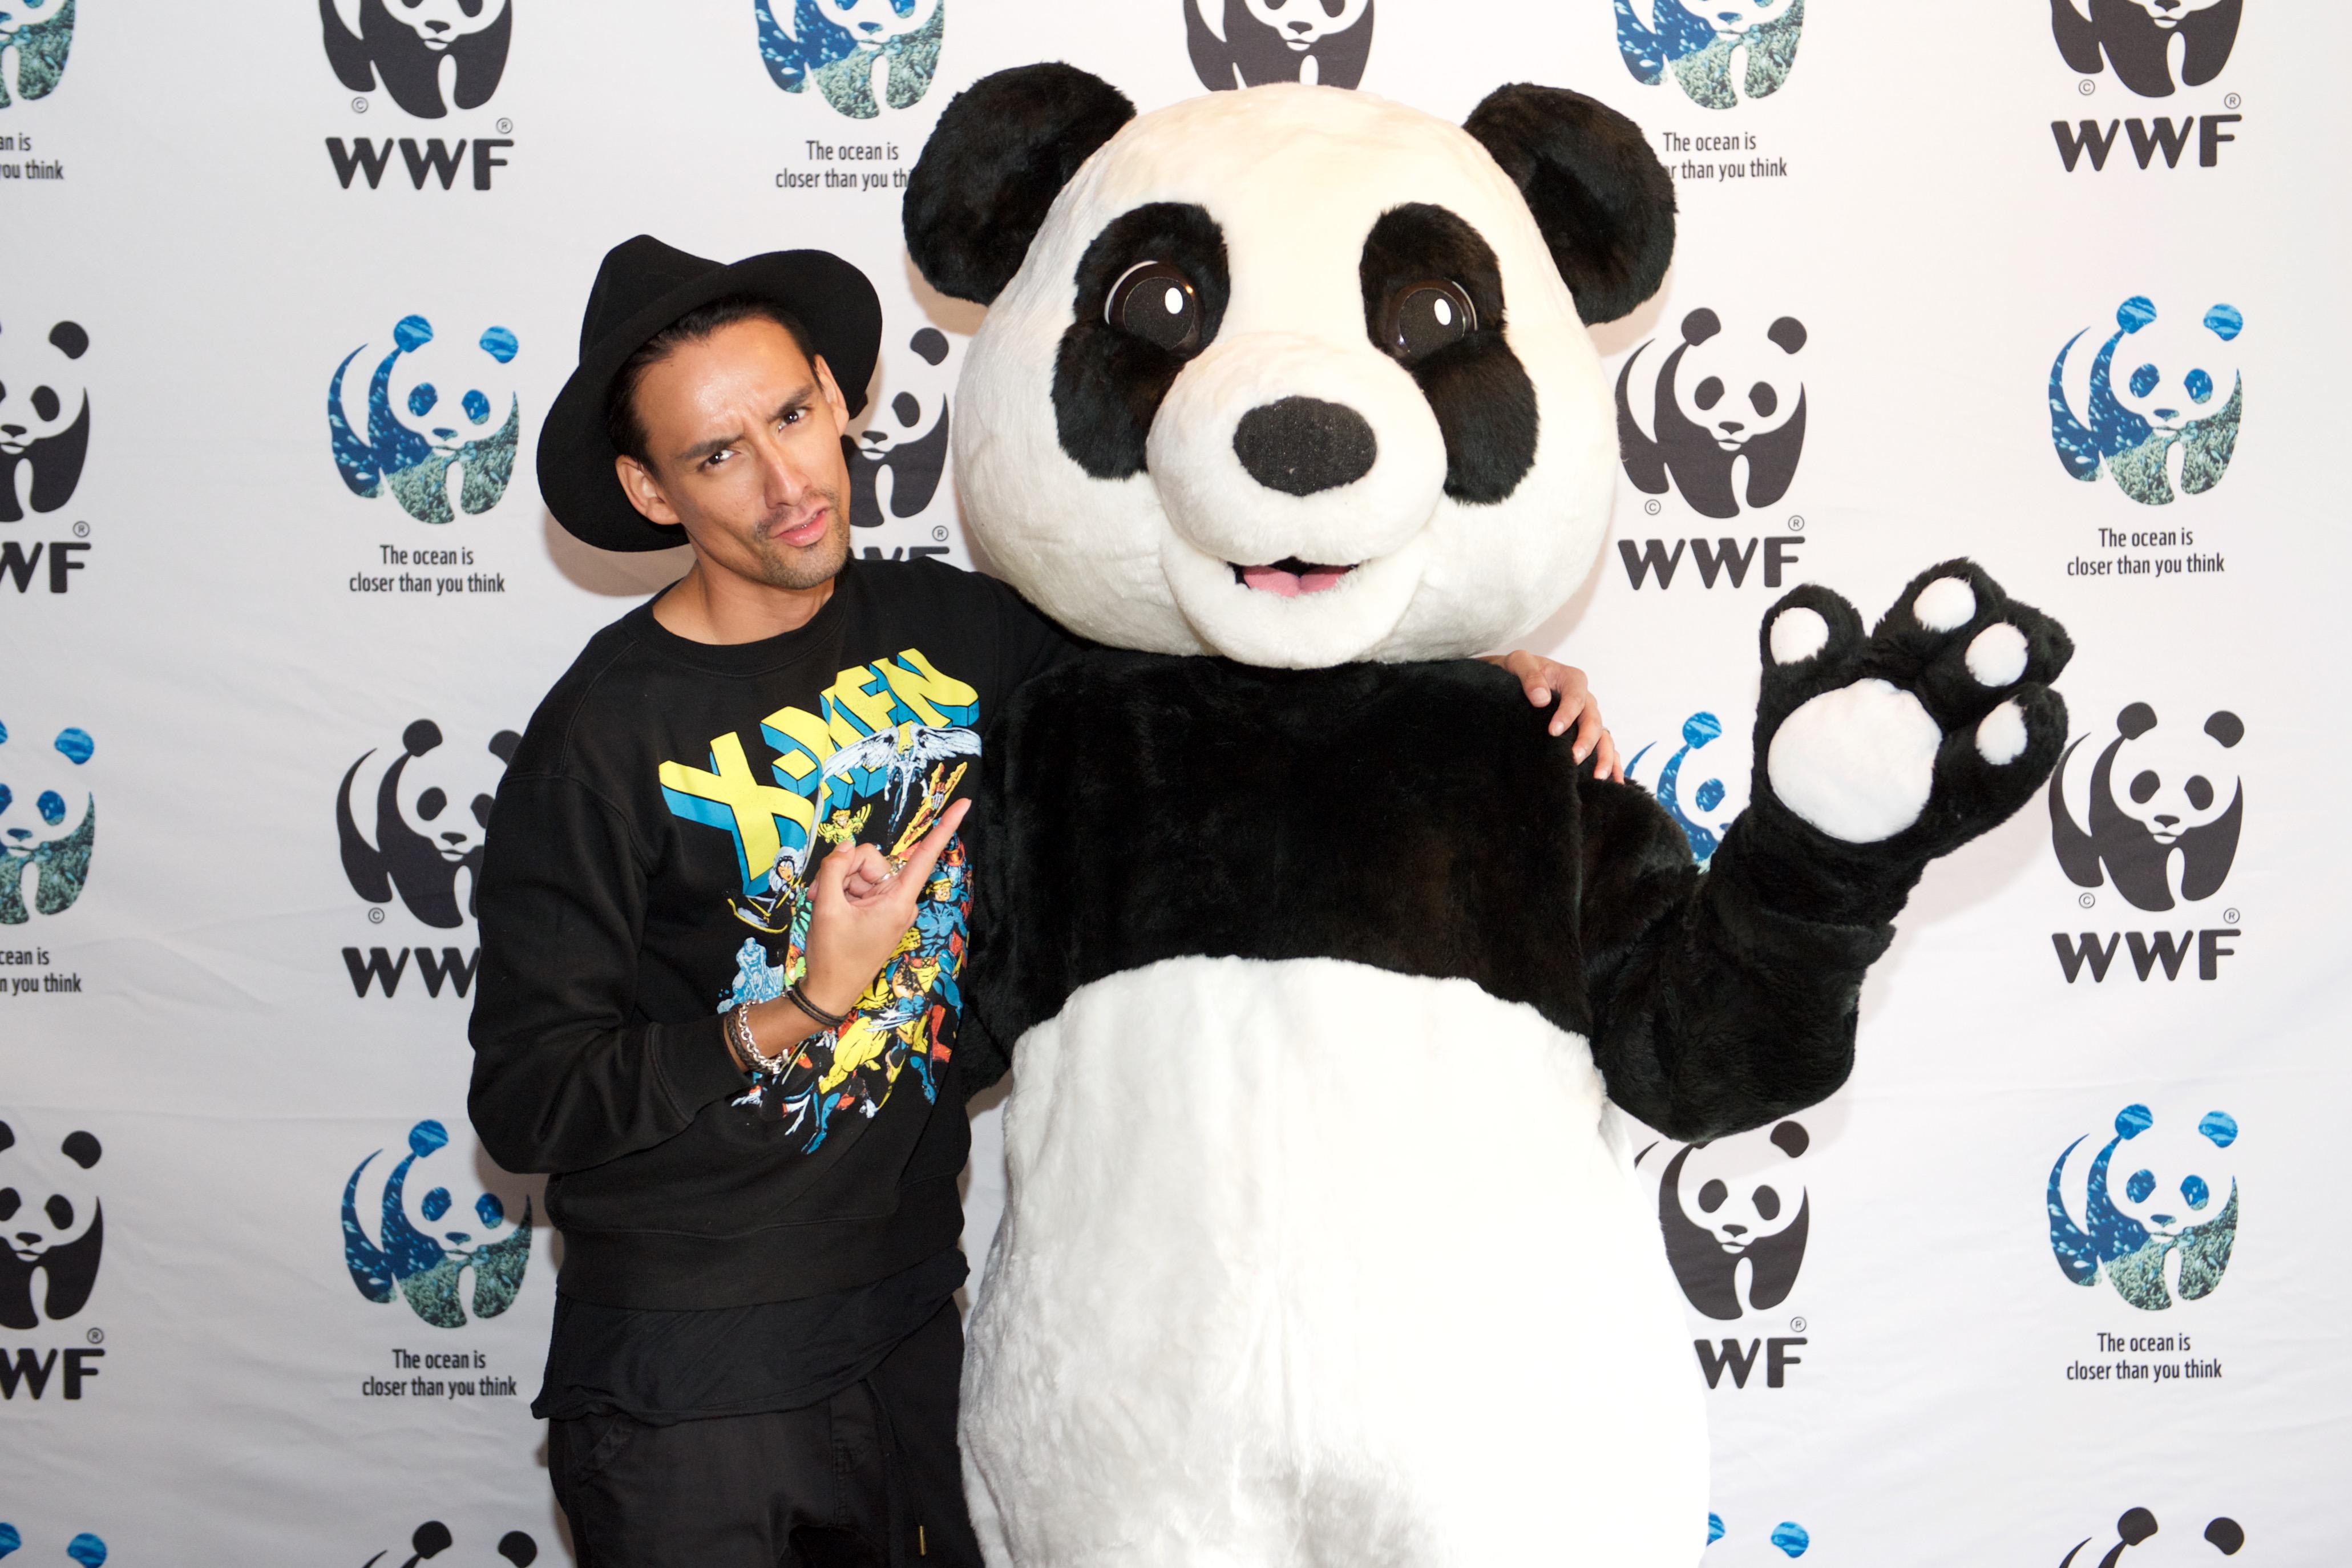 WWF x MSC Sustainable Dinner at Ruby Watchco. Toronto, ON, Canada. June 11, 2015. (Image: Ryan Emberley)